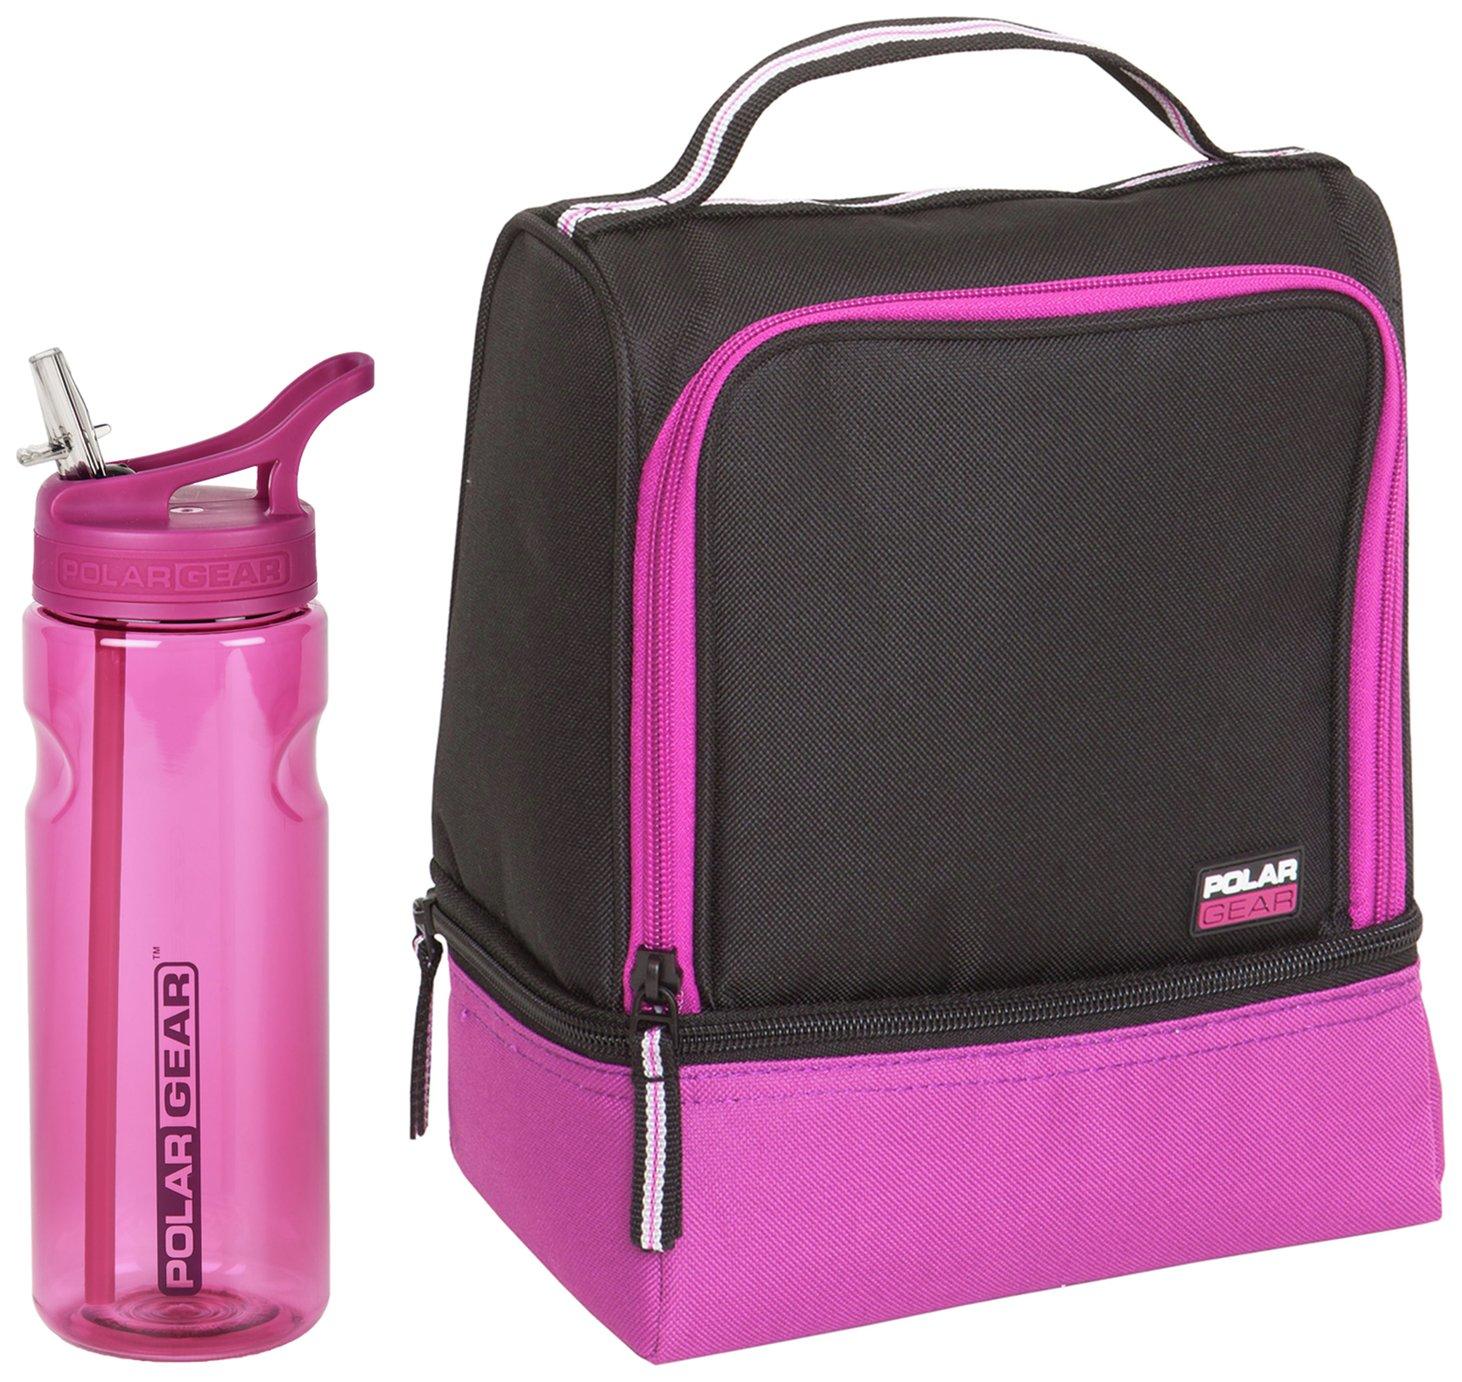 Polar Gear Lunch Bag & Bottle - Berry